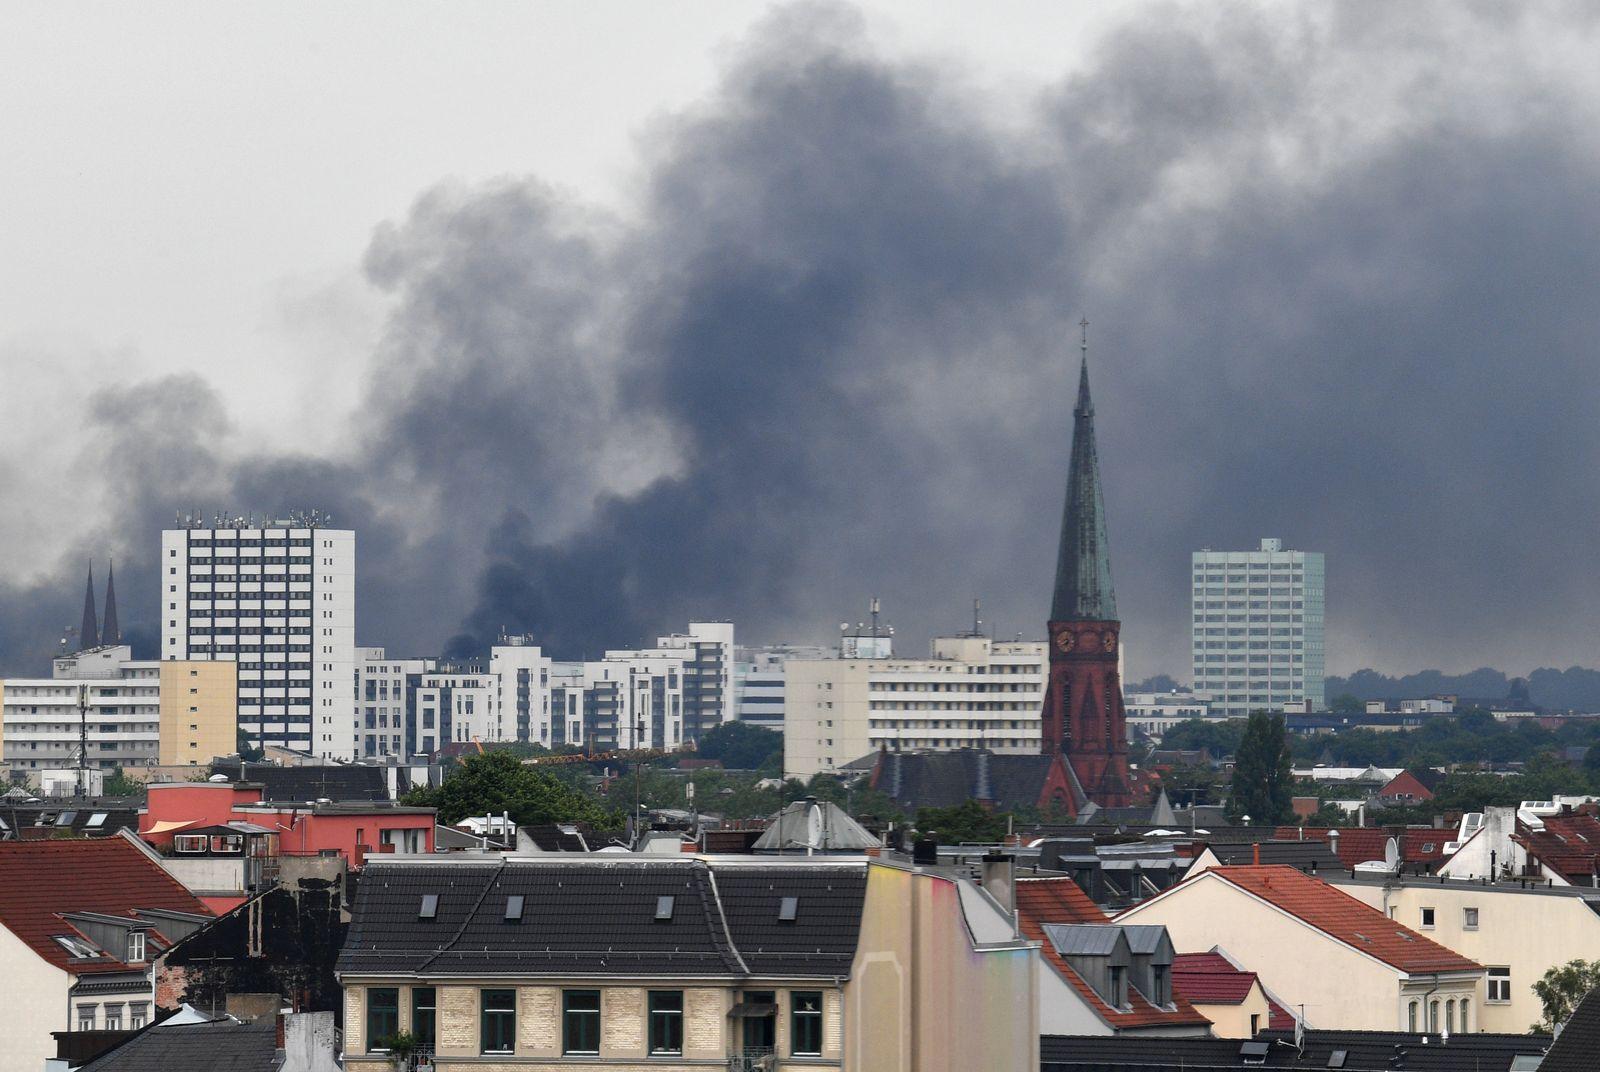 Freitag/ G20 / Hamburg/ rauchschwade